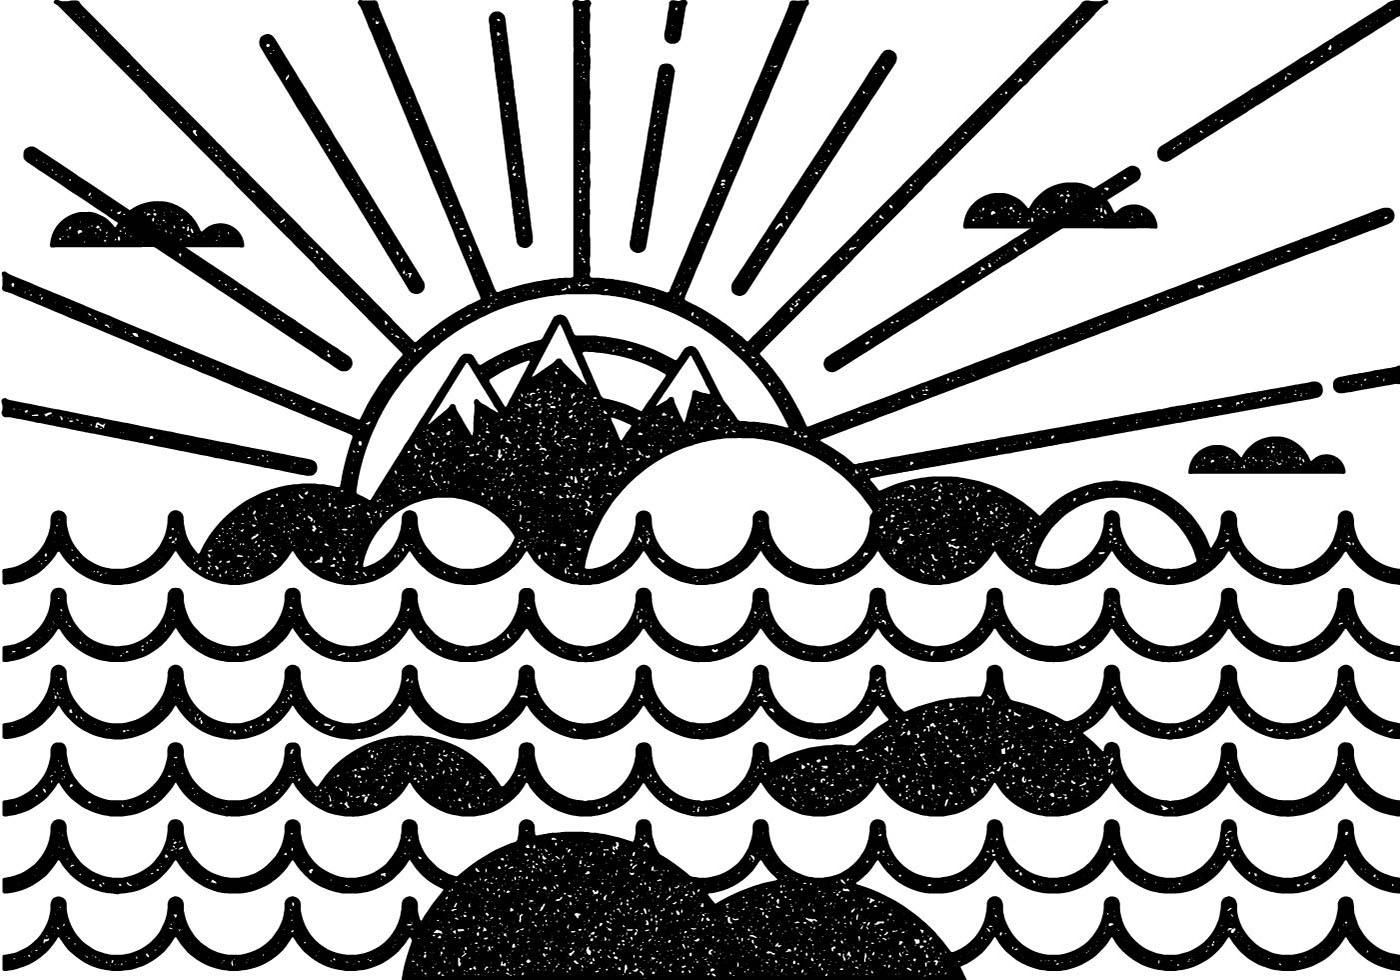 Minimal seascape vector download free vector art stock for Minimal art vector